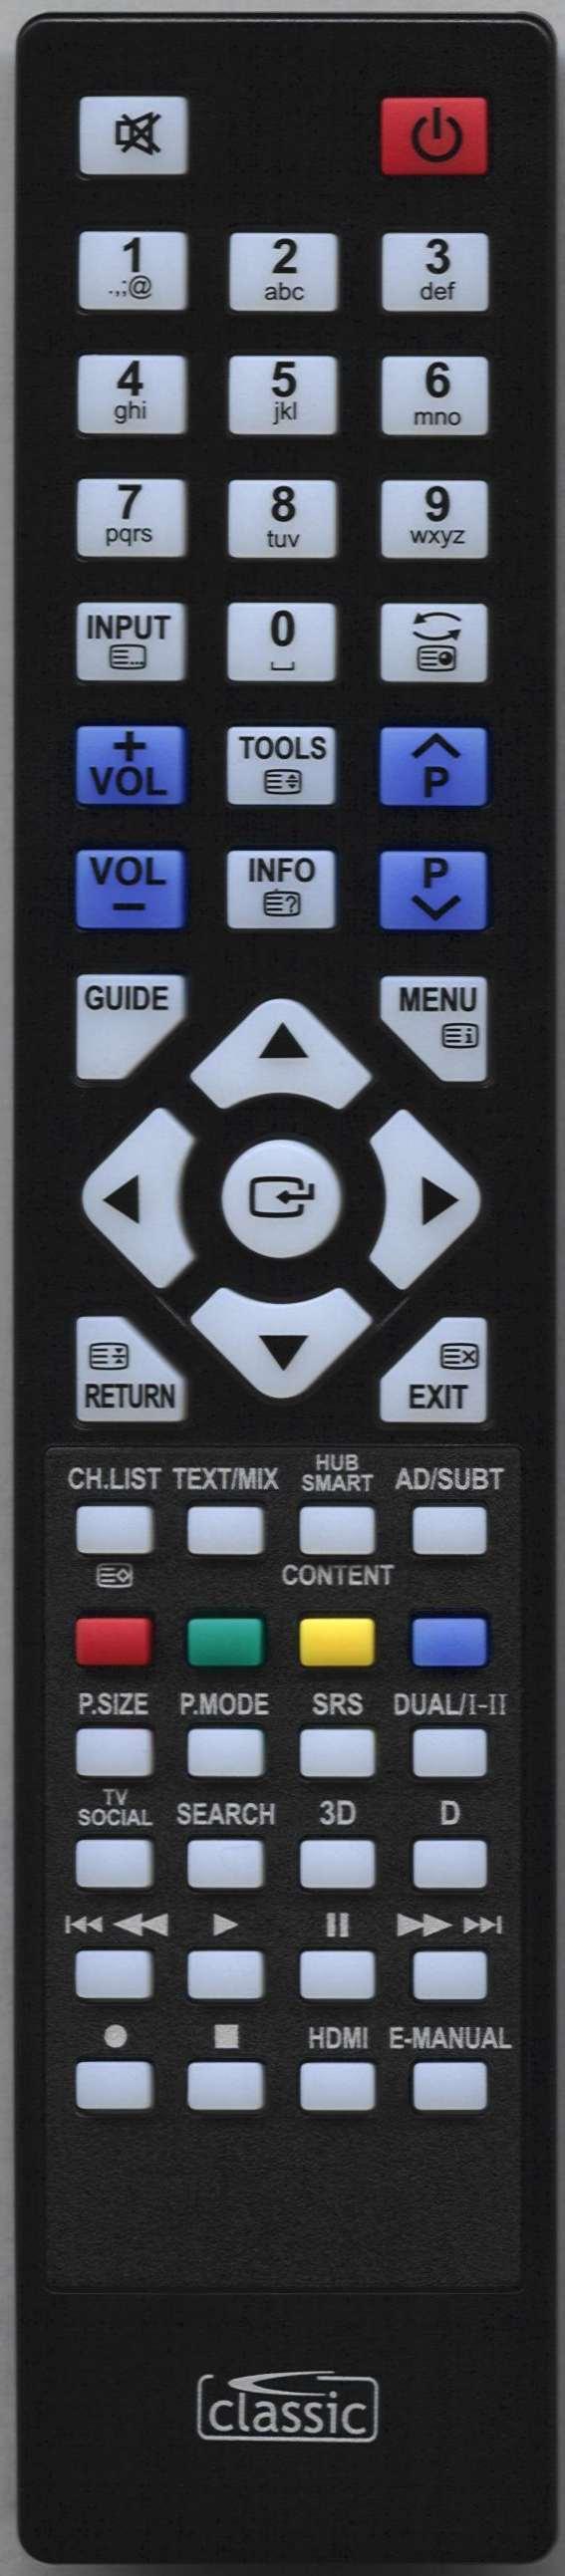 SAMSUNG UE40EH5000KXXU Remote Control Alternative